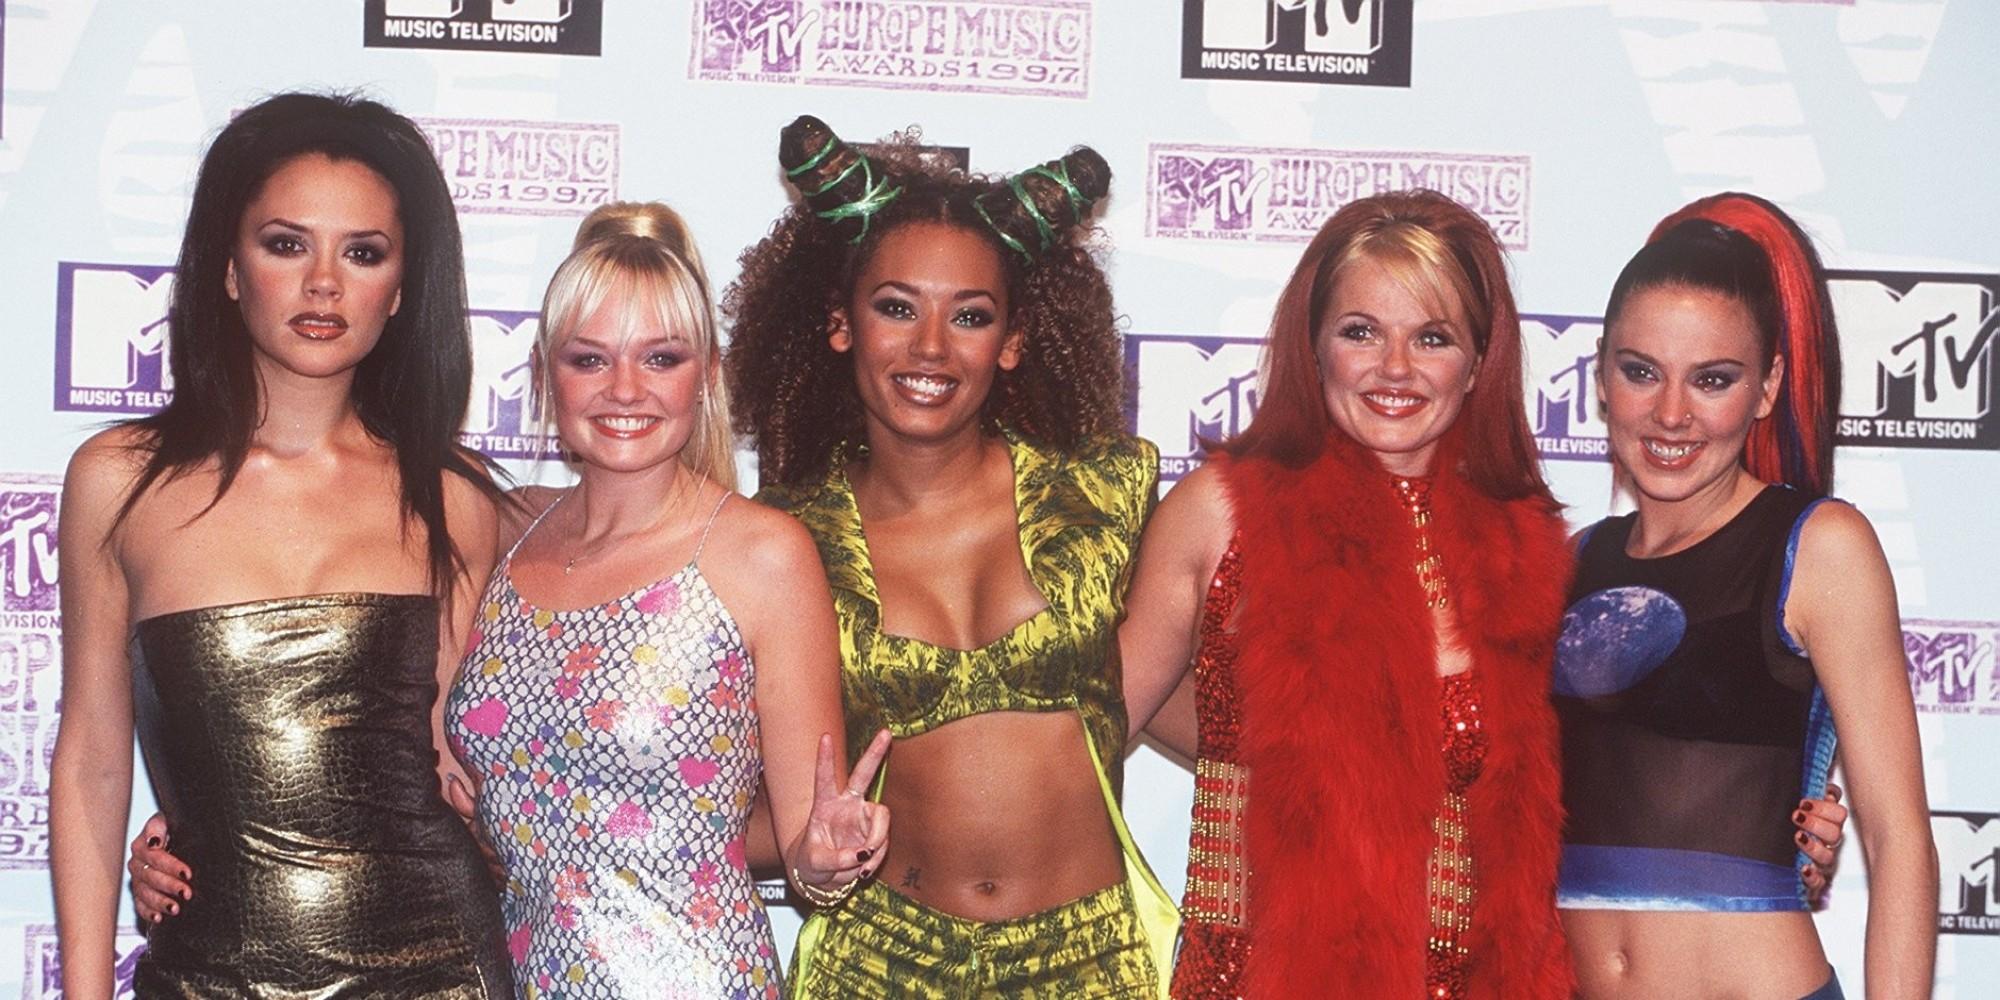 Former Spice Girl Mel B Describes Her Strict Approach